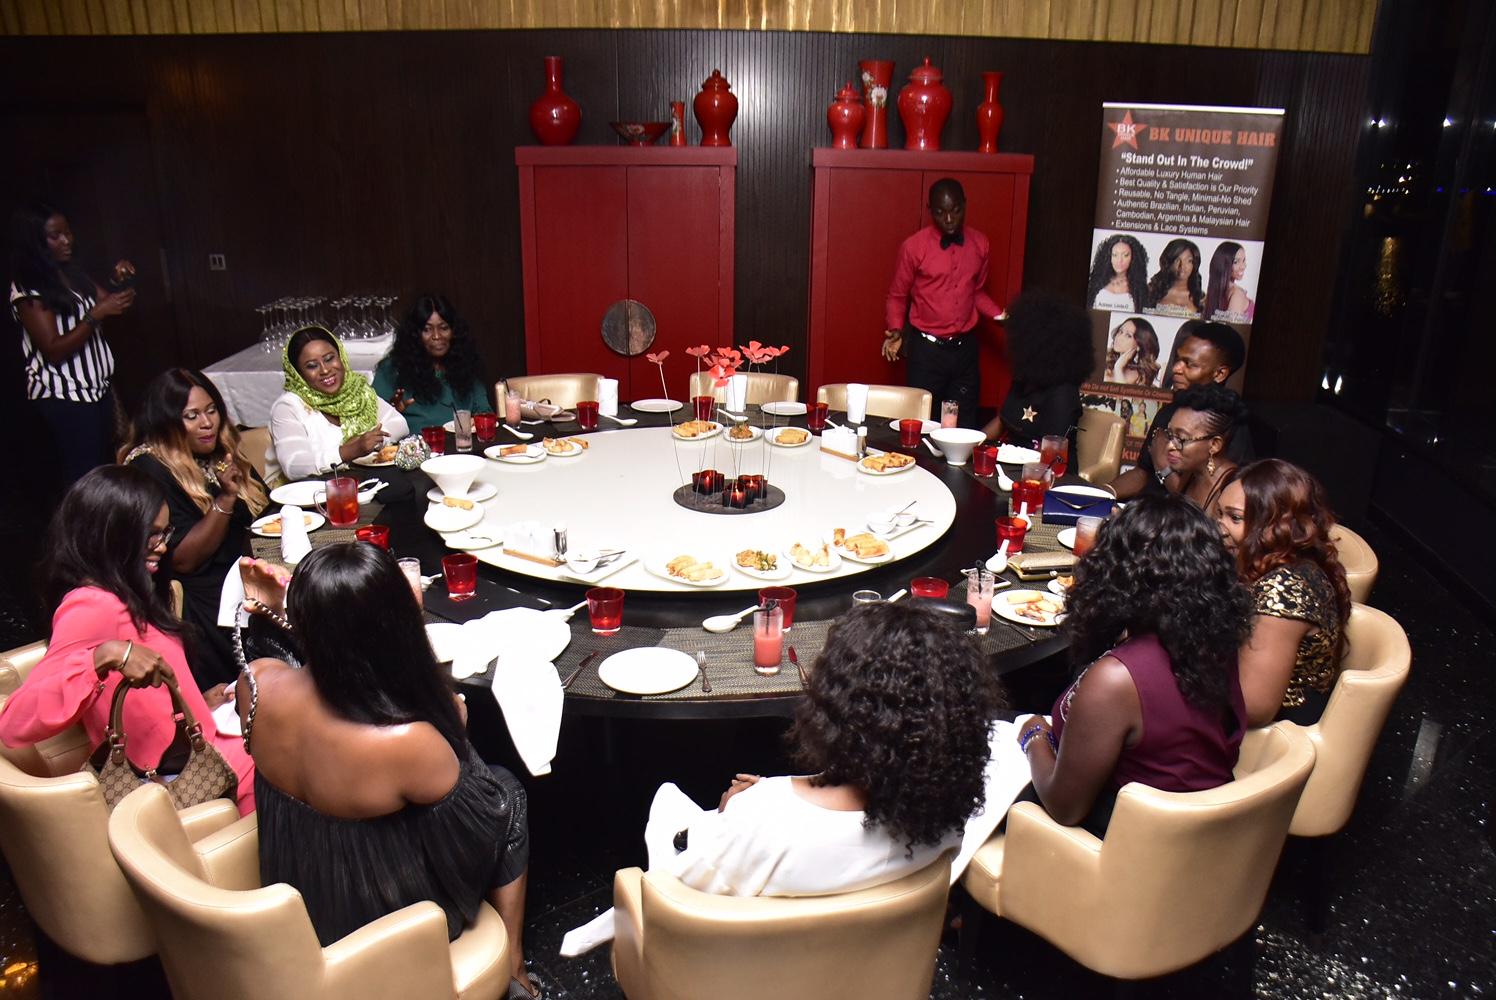 BK Unique Hair MyHairMyCrown Campaign With Brand Ambassador Rita Dominic